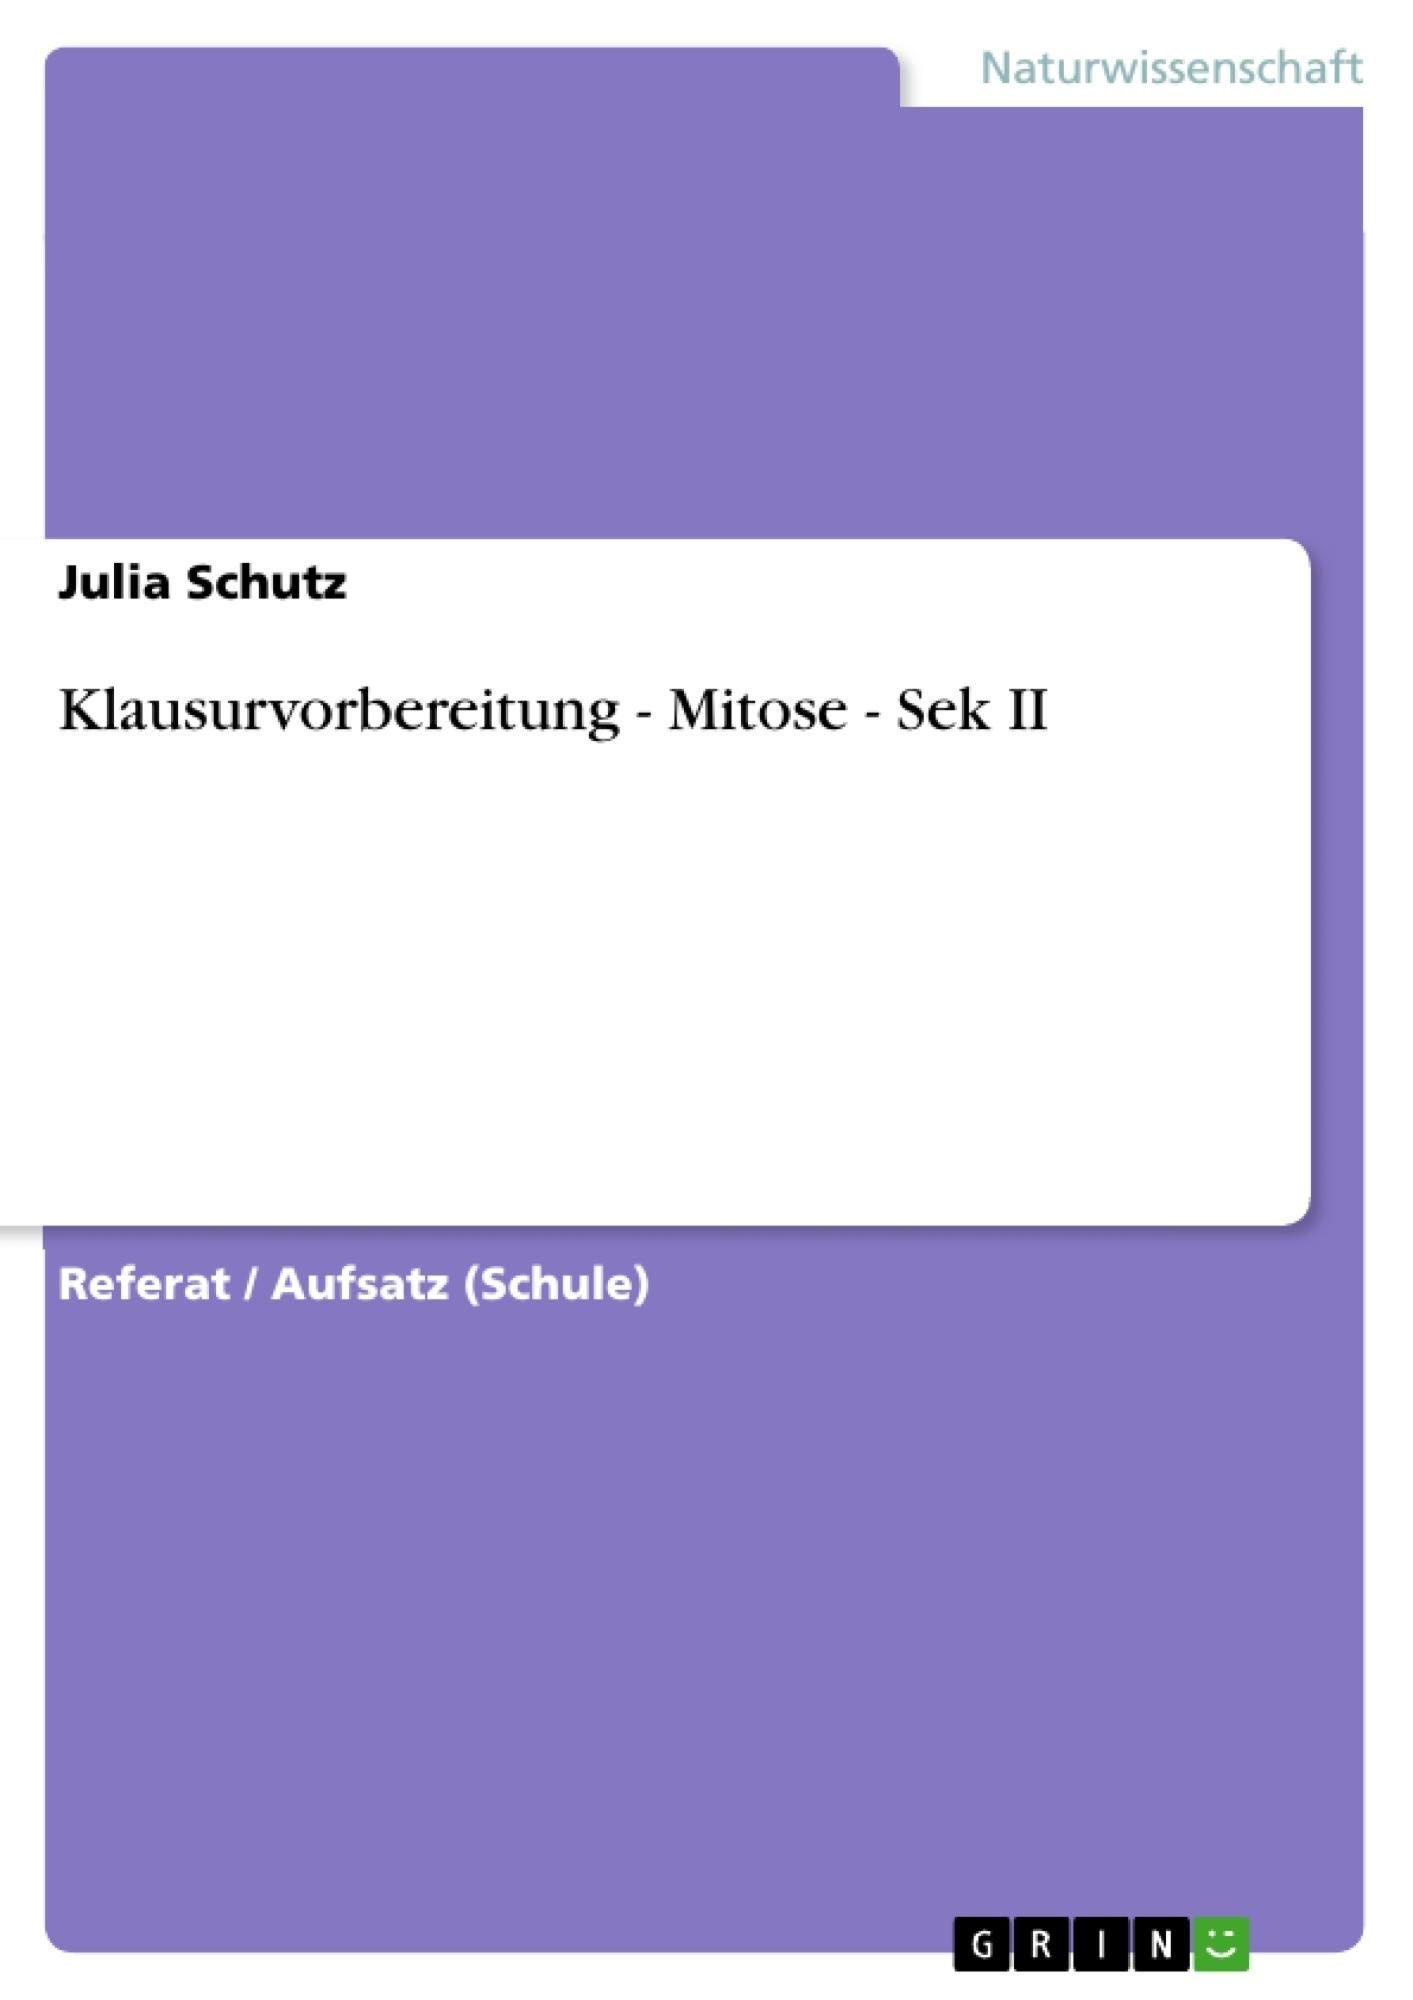 Titel: Klausurvorbereitung -  Mitose - Sek II